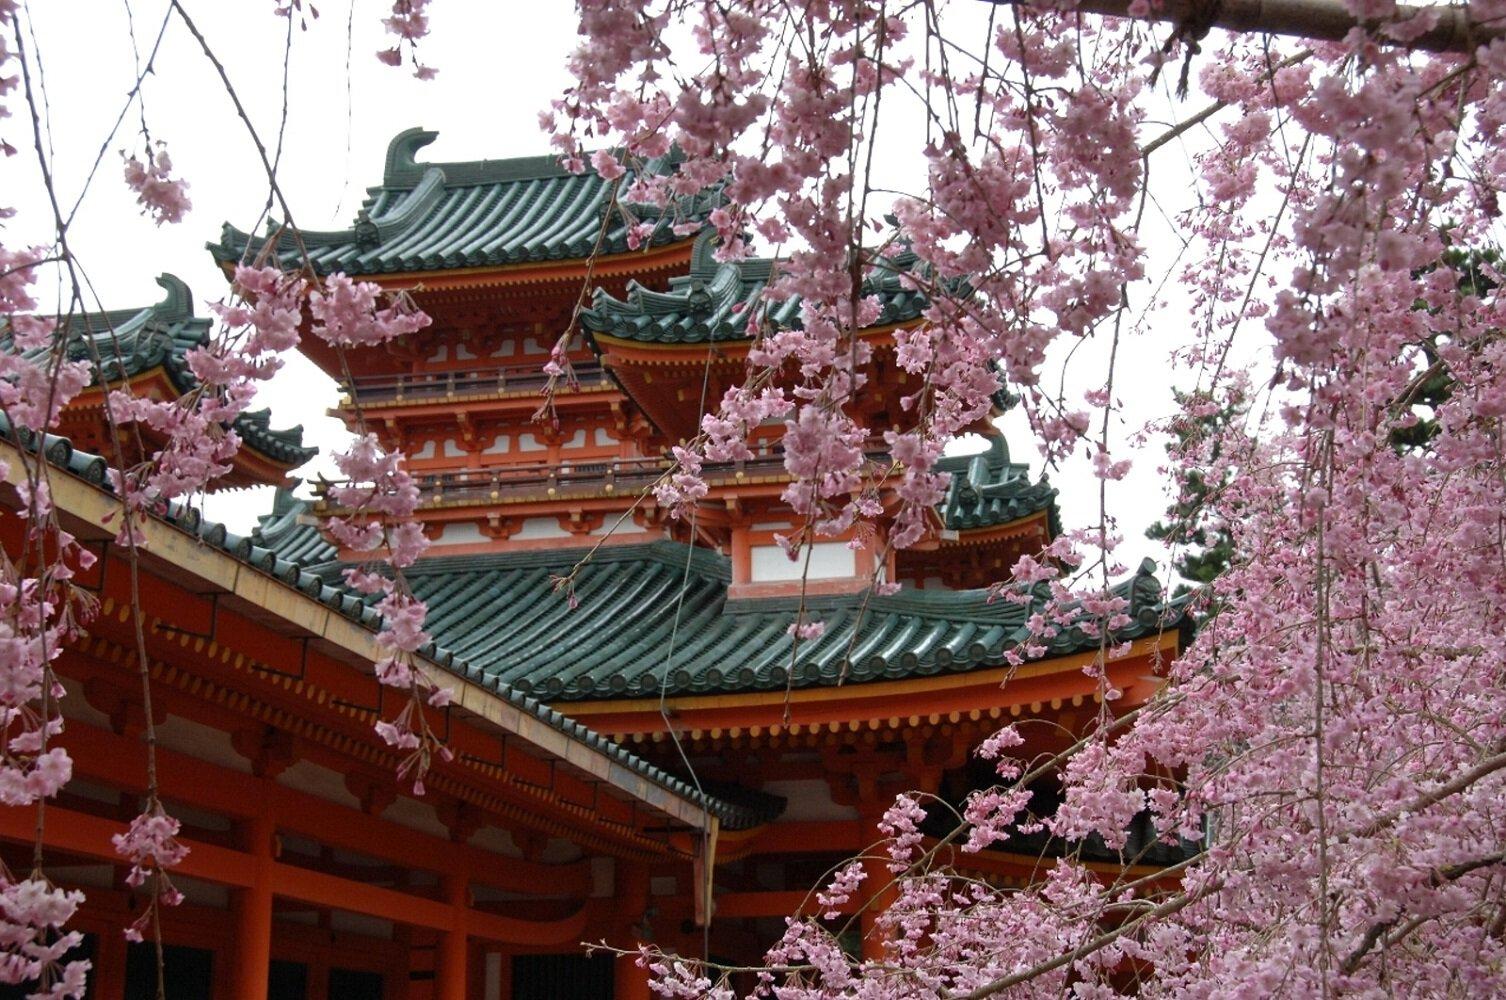 花見シーズン到来!京都の桜名所